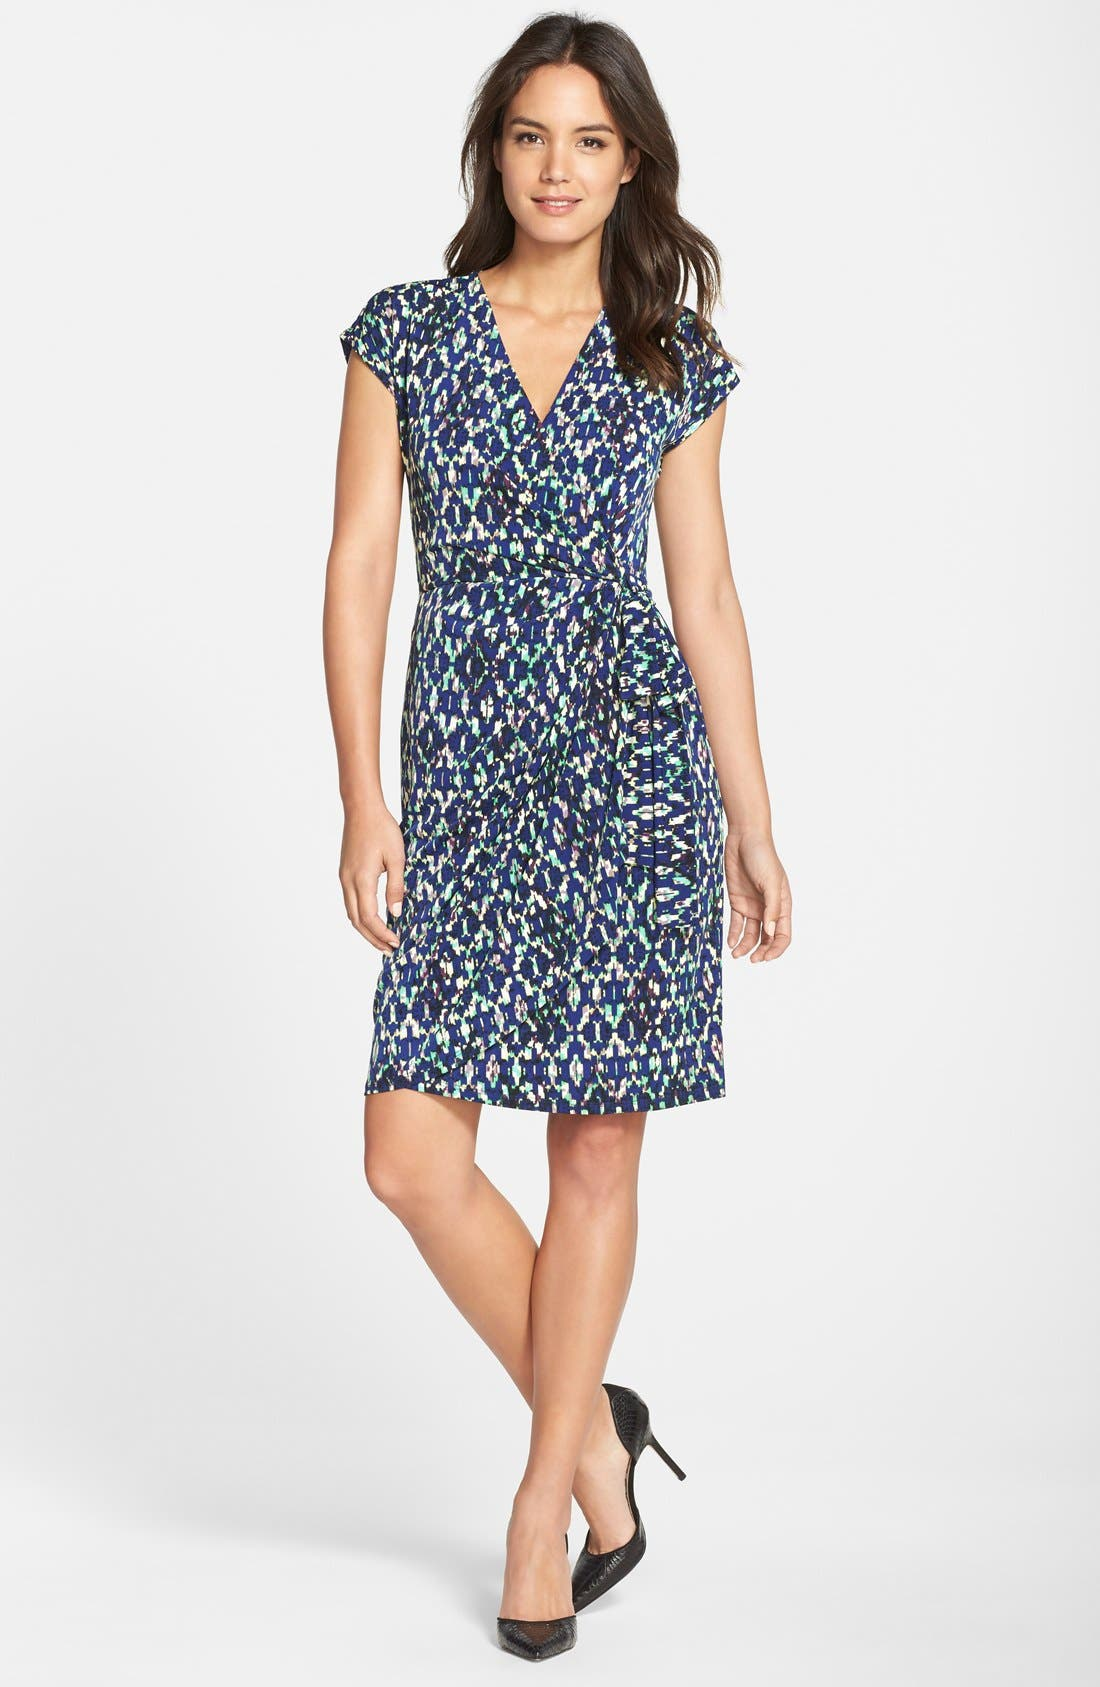 MAGGY LONDON, Ikat Print Wrap Dress, Alternate thumbnail 4, color, 400